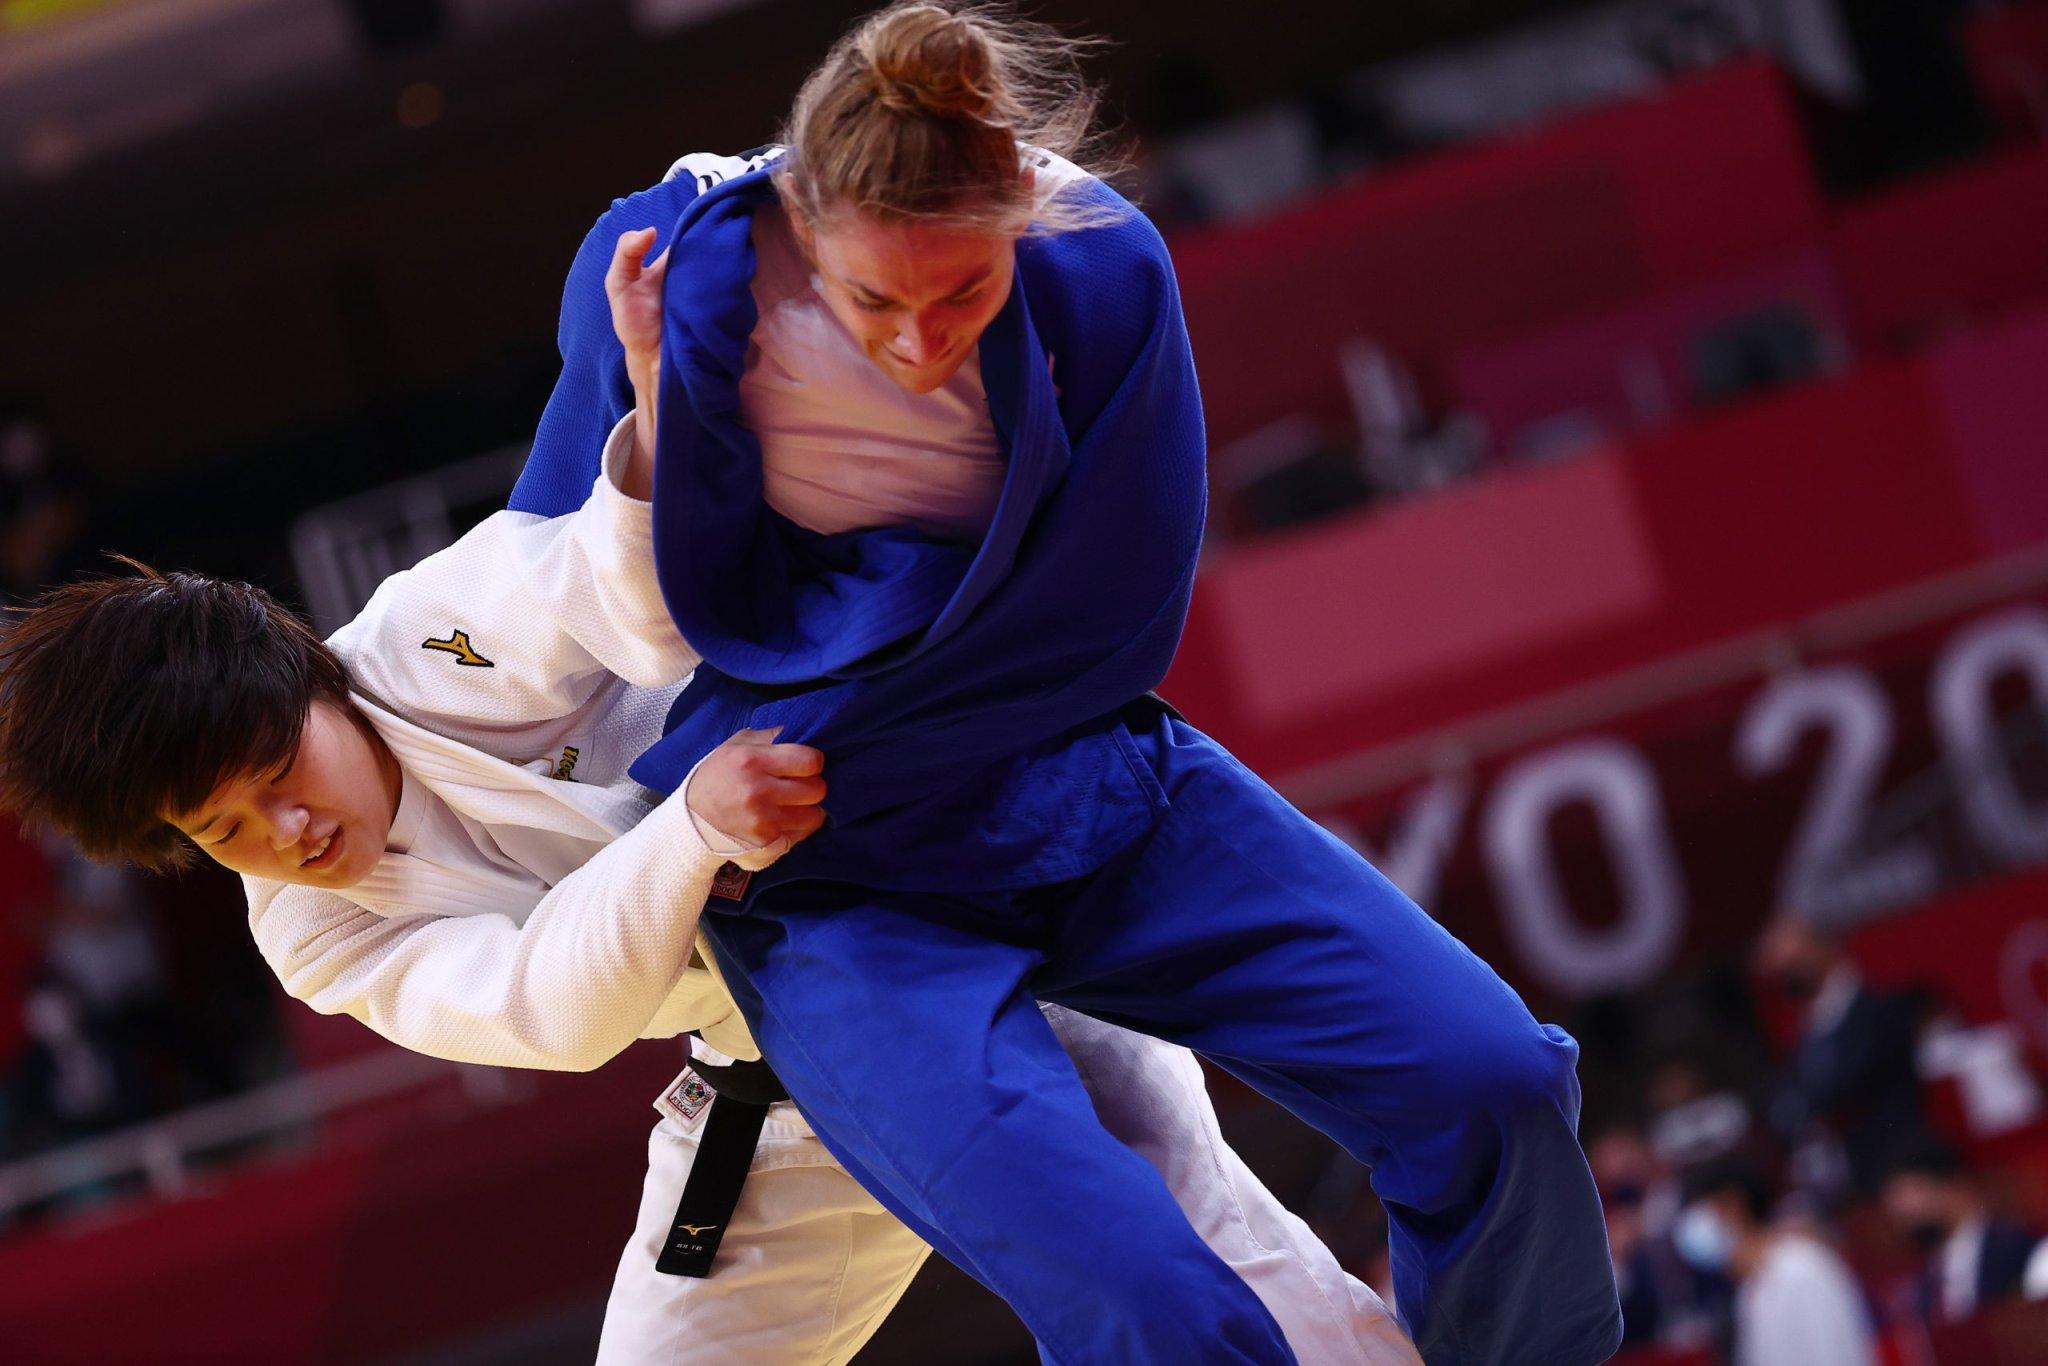 Olympics-Judo-Arai wins women's -70 kg gold to keep Japan medal rush going